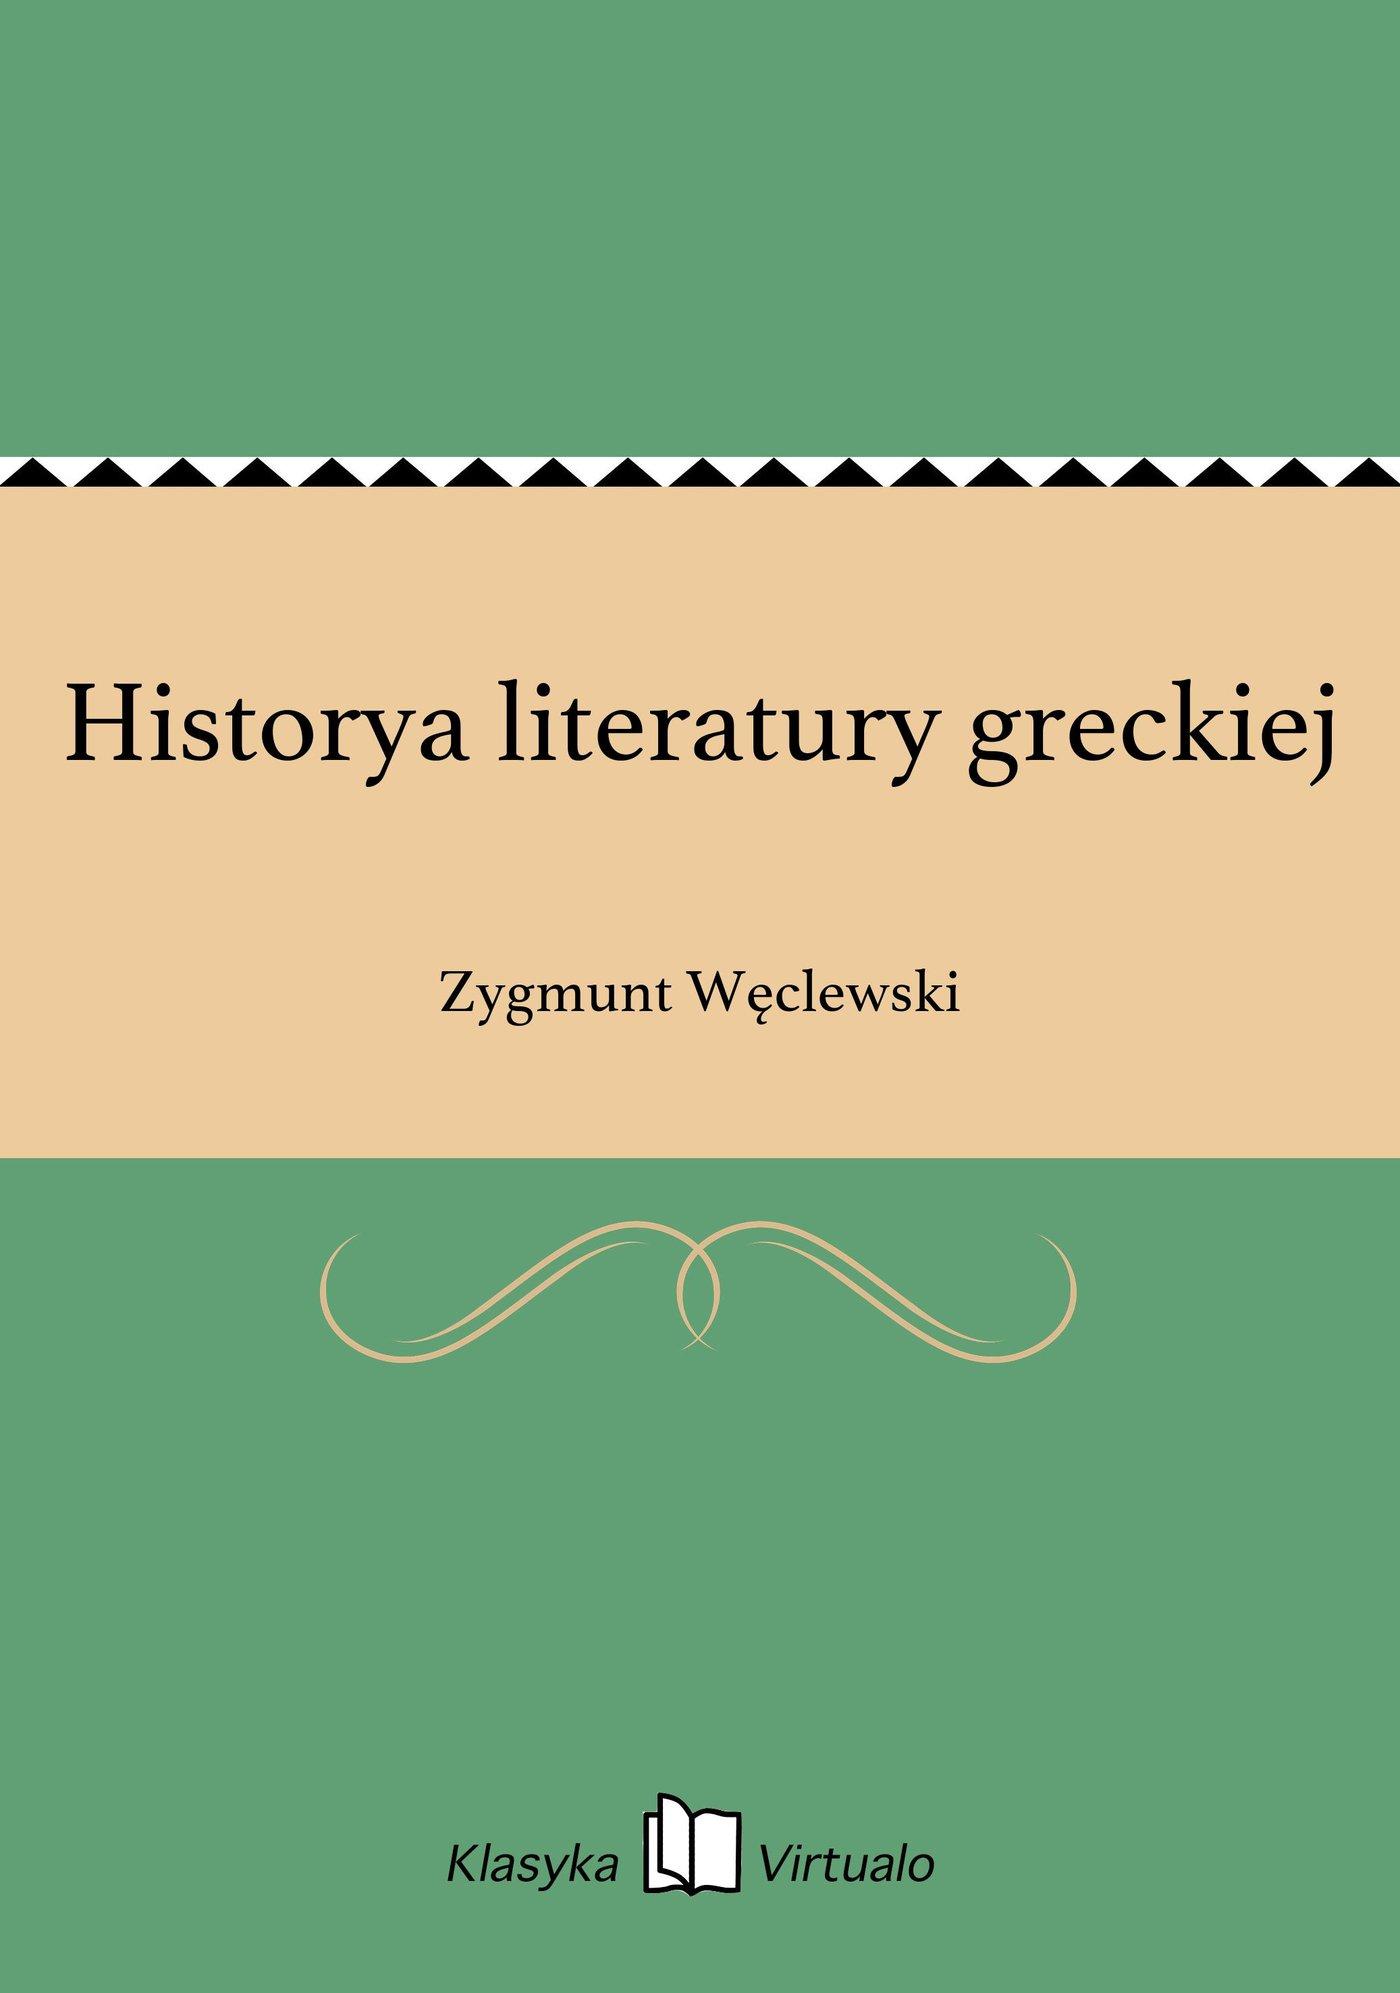 Historya literatury greckiej - Ebook (Książka EPUB) do pobrania w formacie EPUB